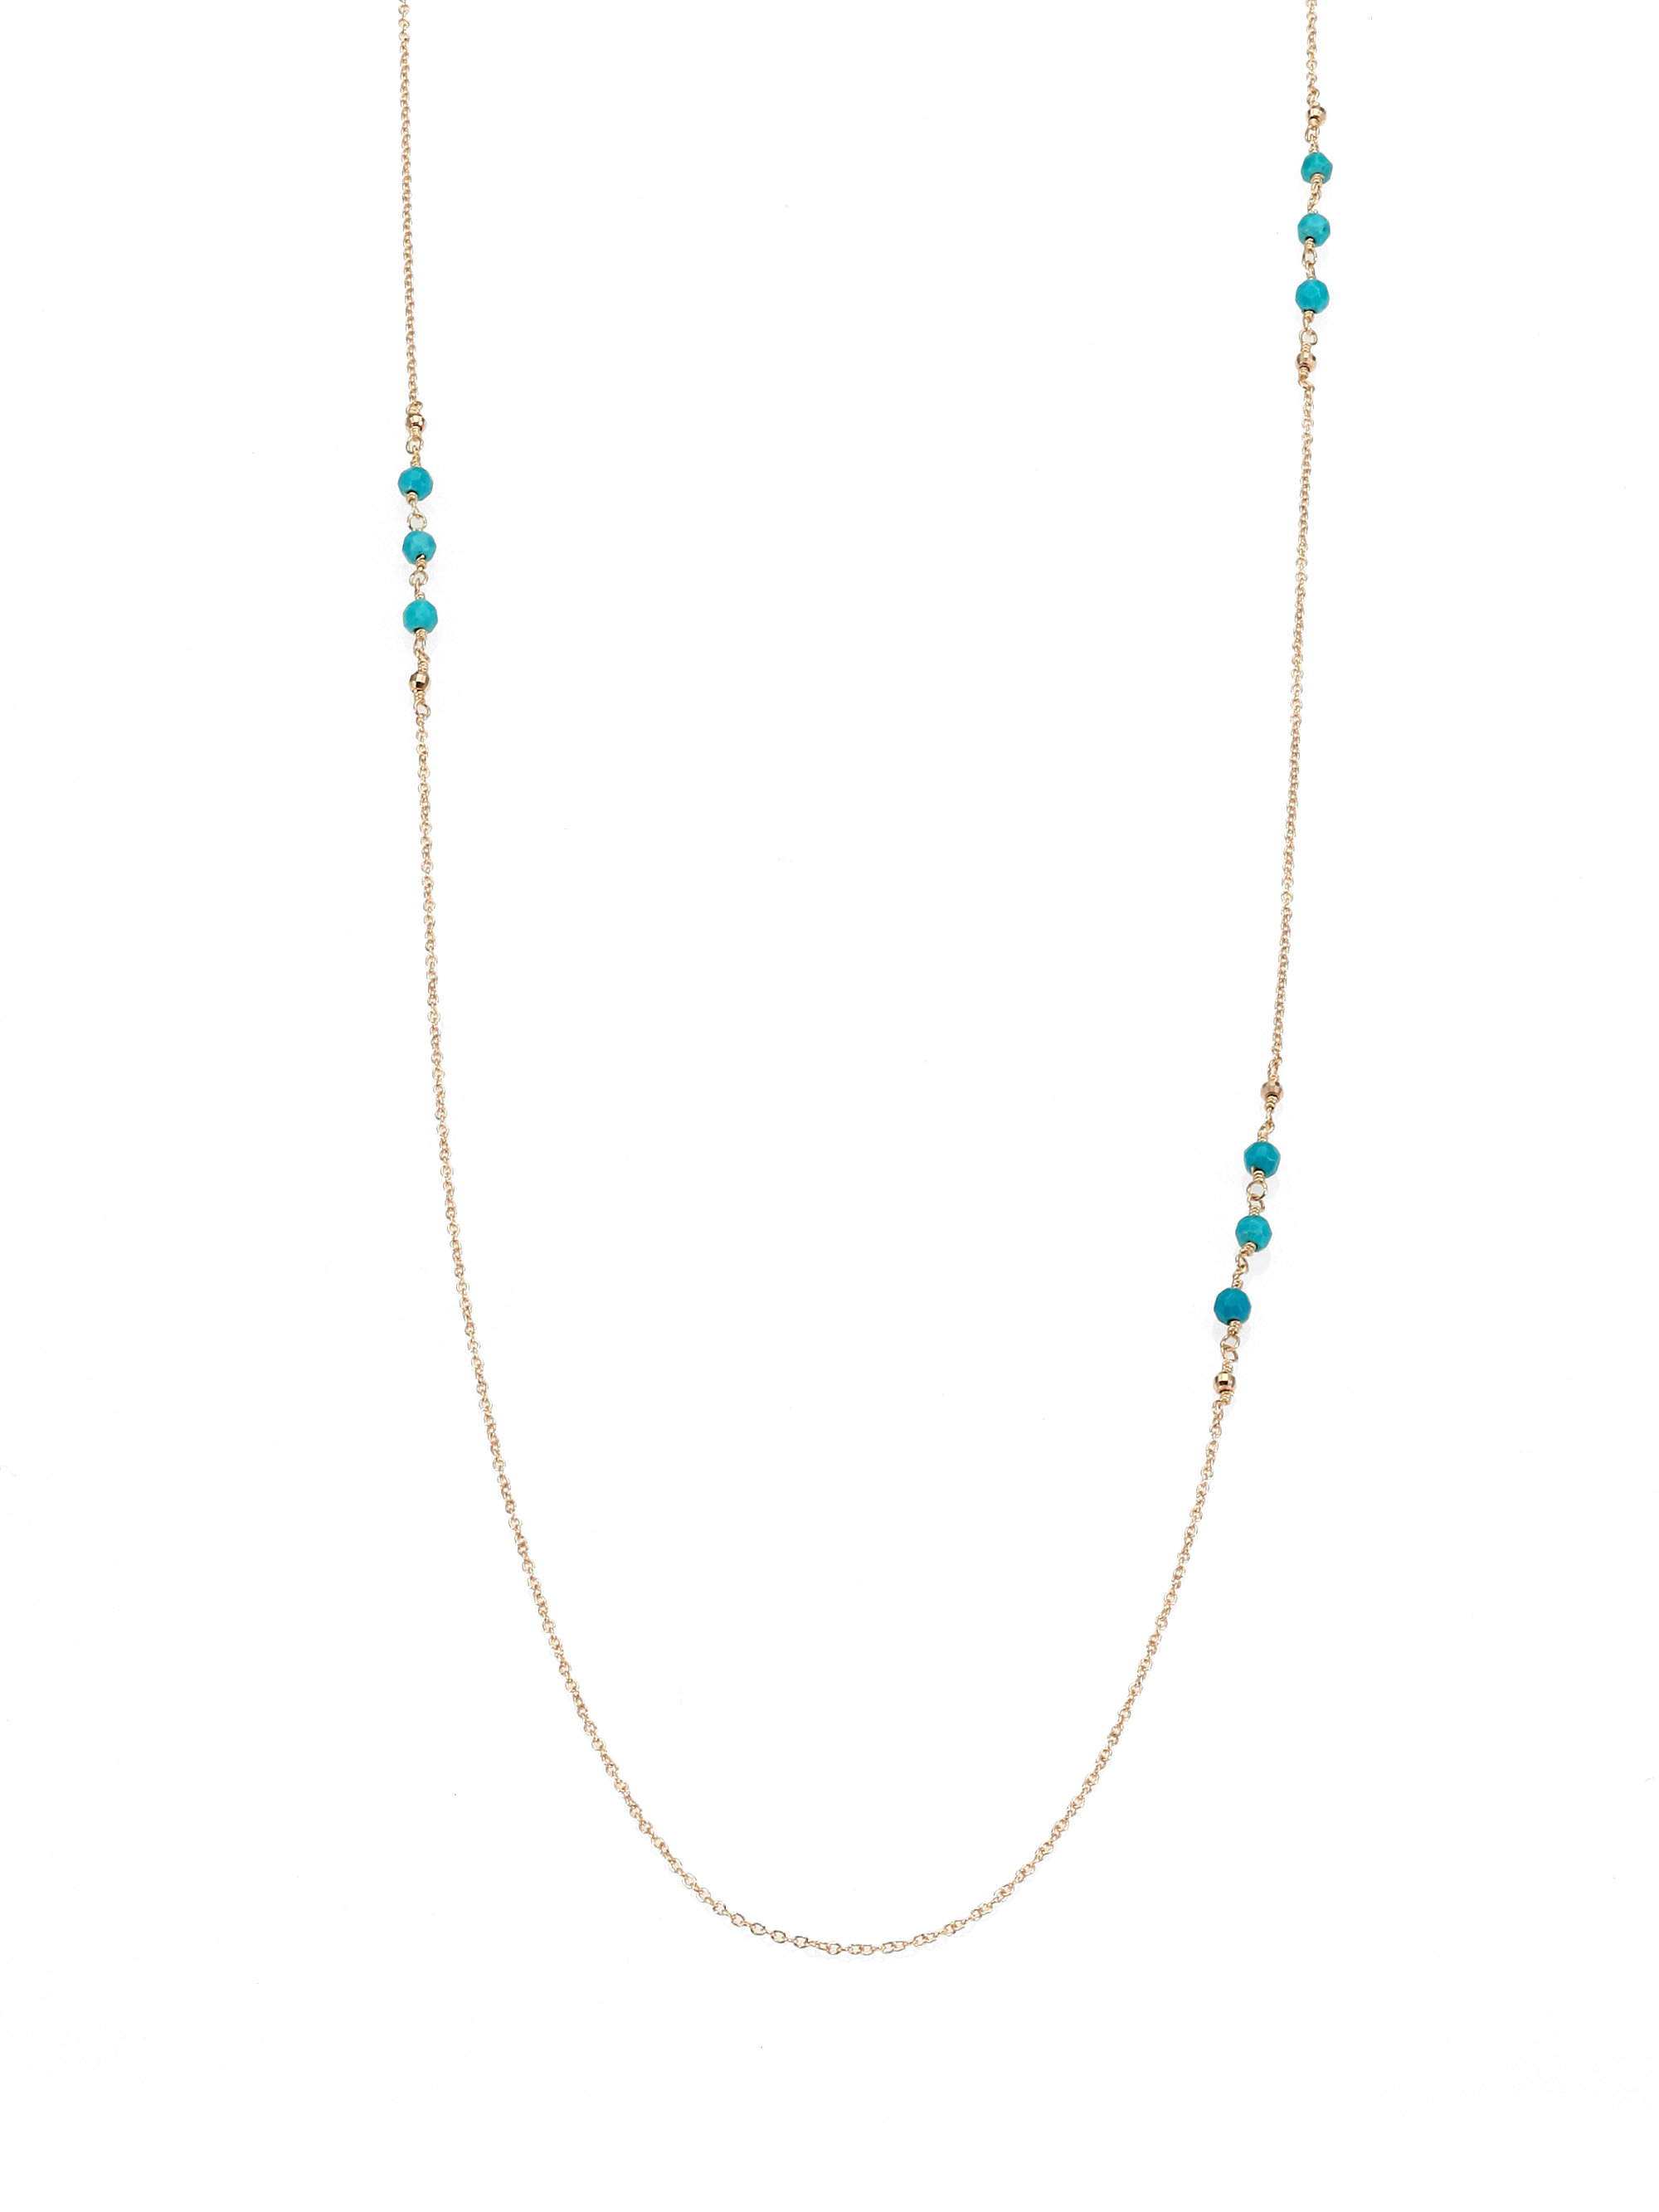 Mizuki Turquoise 14k Yellow Gold Chain Necklace in Metallic